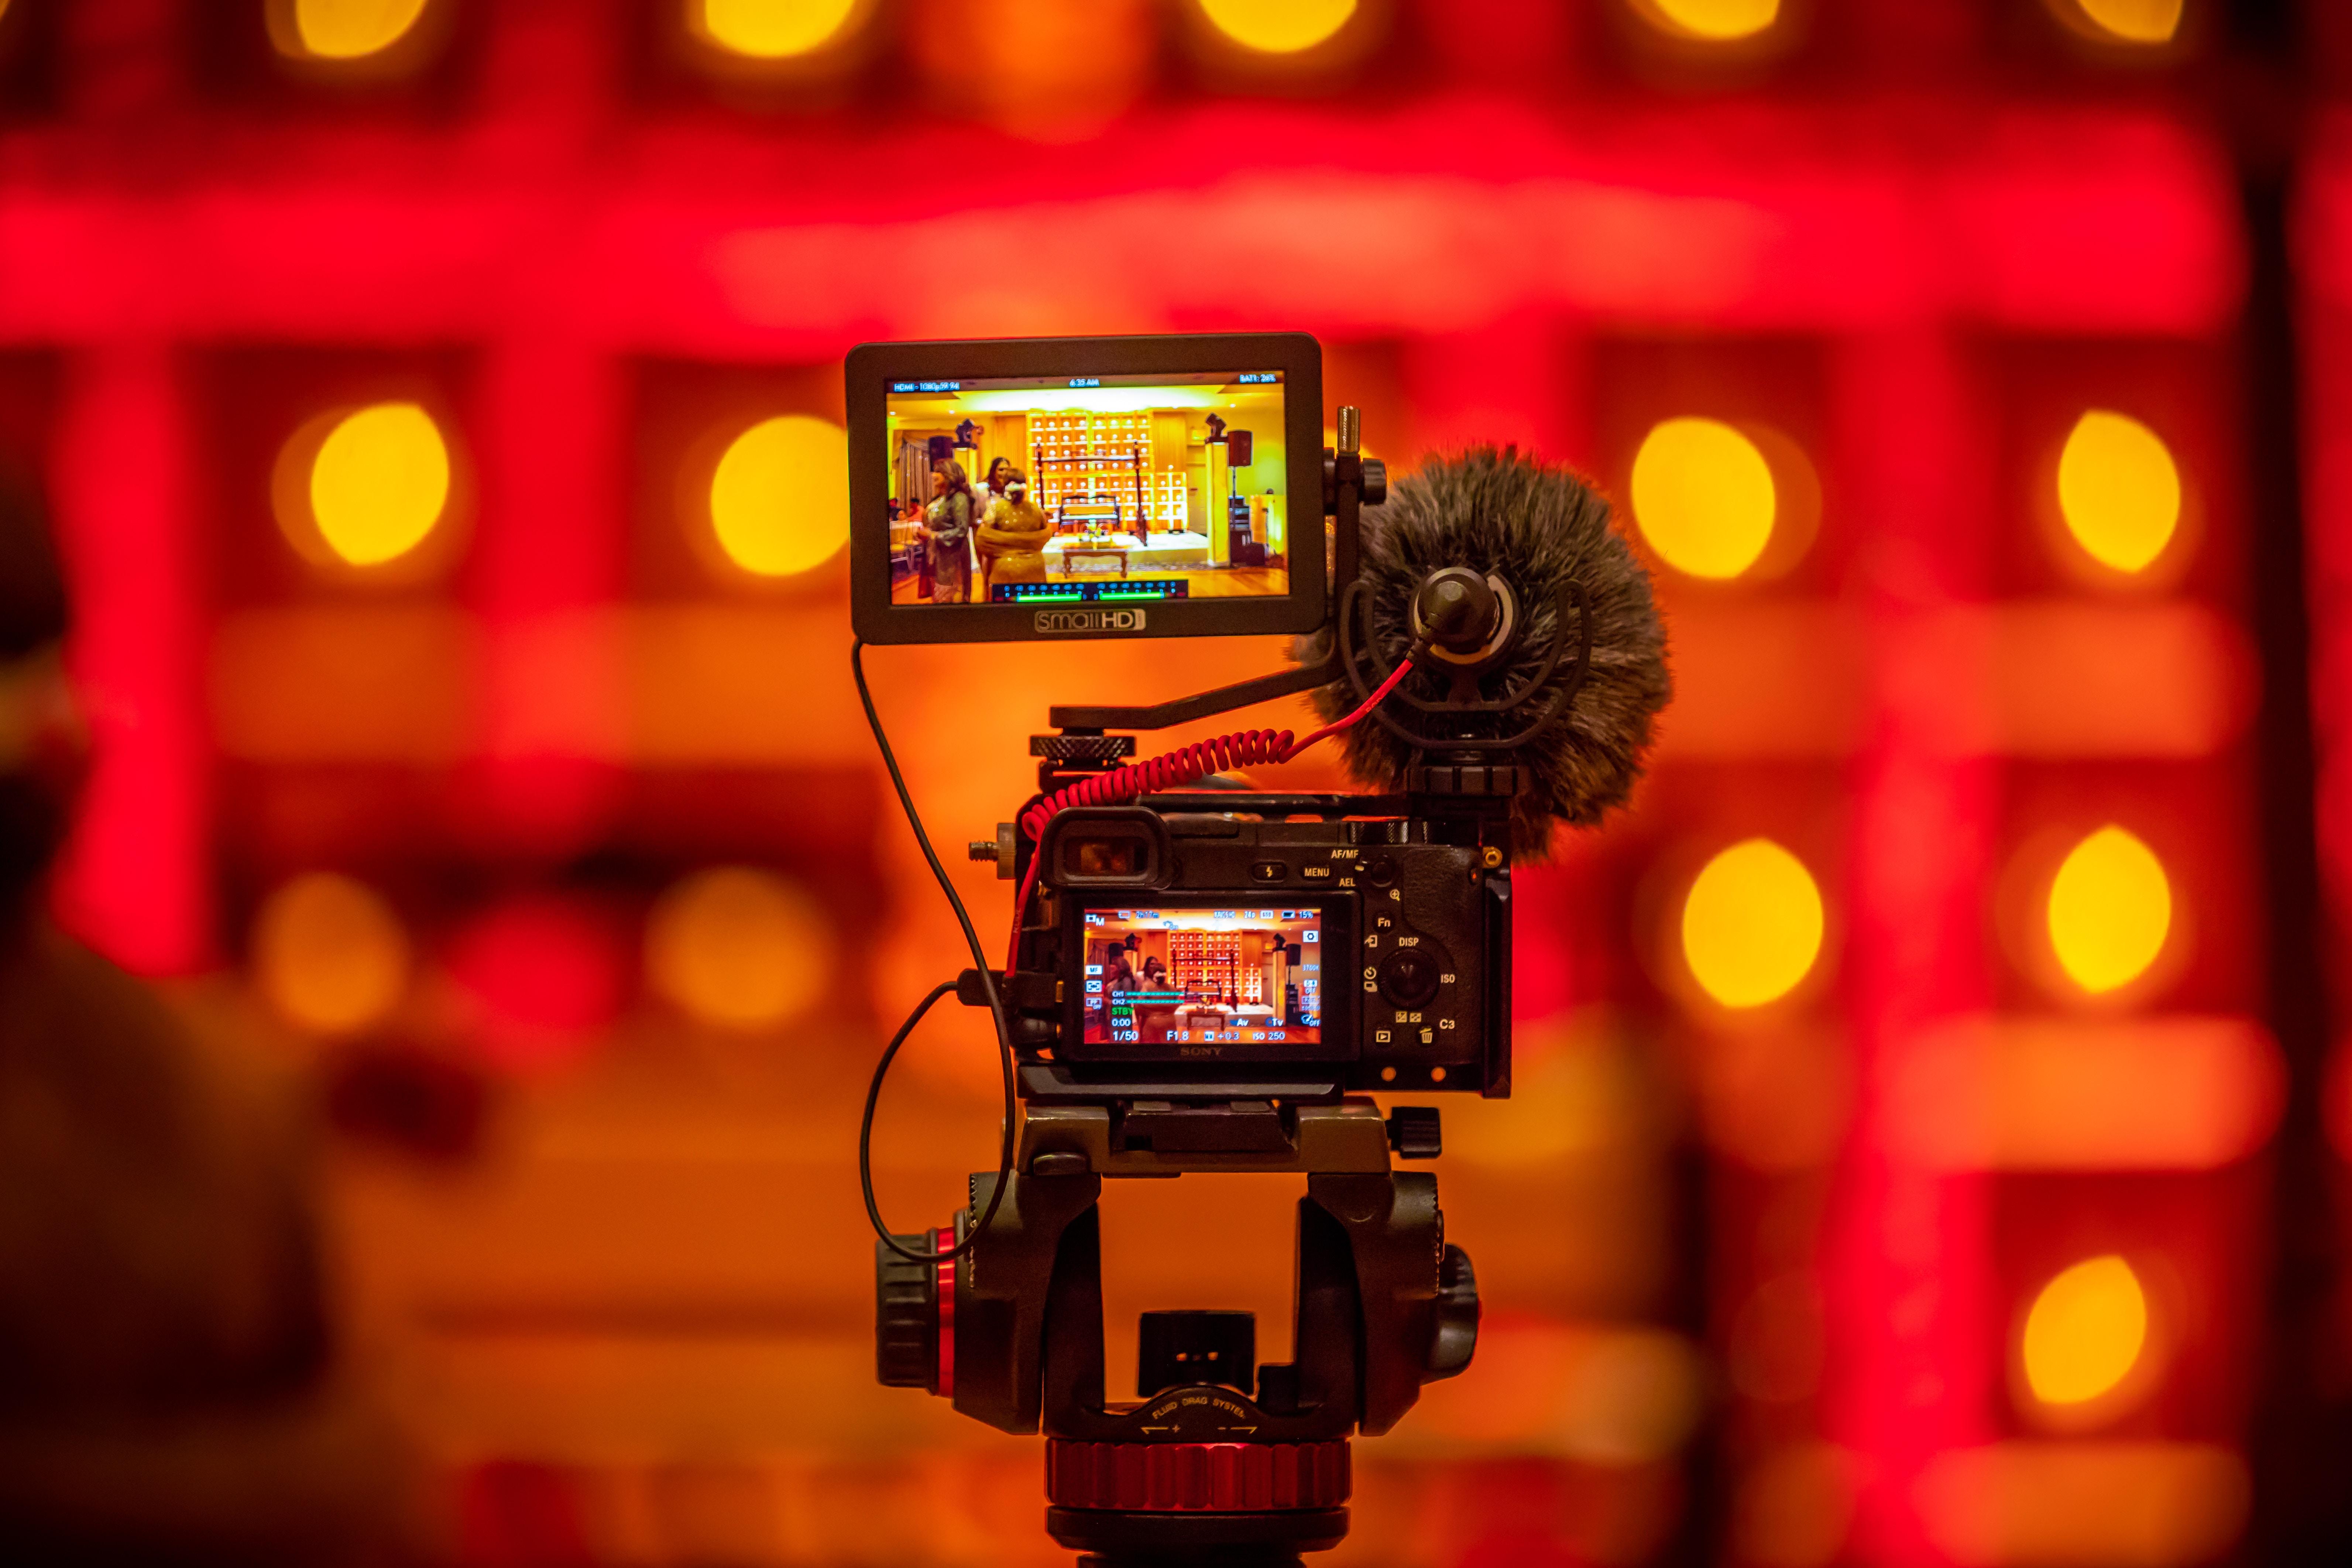 Plataformas para vídeo live streaming (I): Profesionales